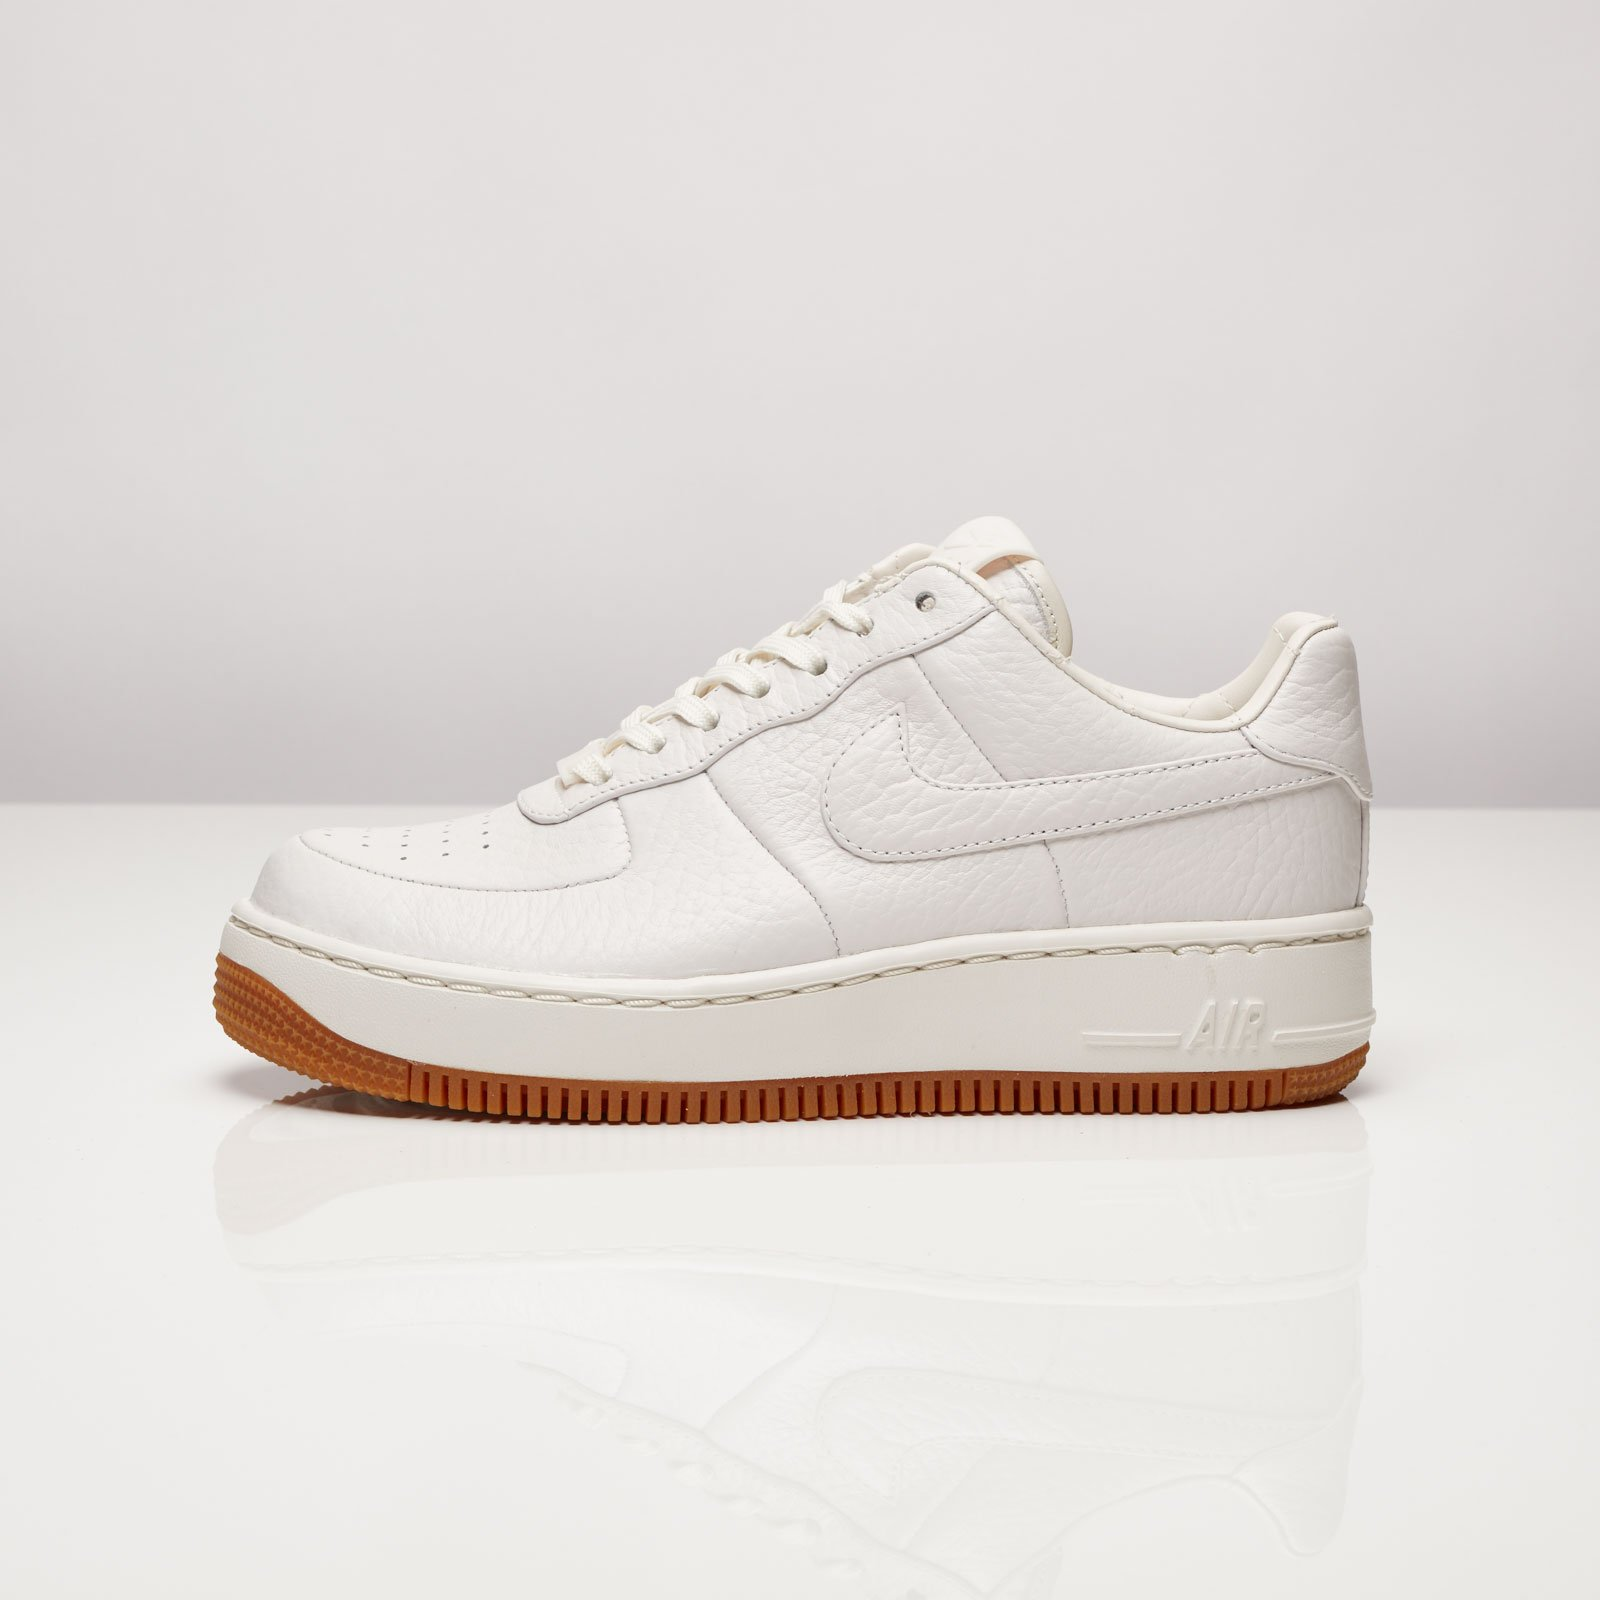 timeless design 9d1d1 cc49a Nike W Af1 Low Upstep Pinnacle - 856477-002 - Sneakersnstuff ...